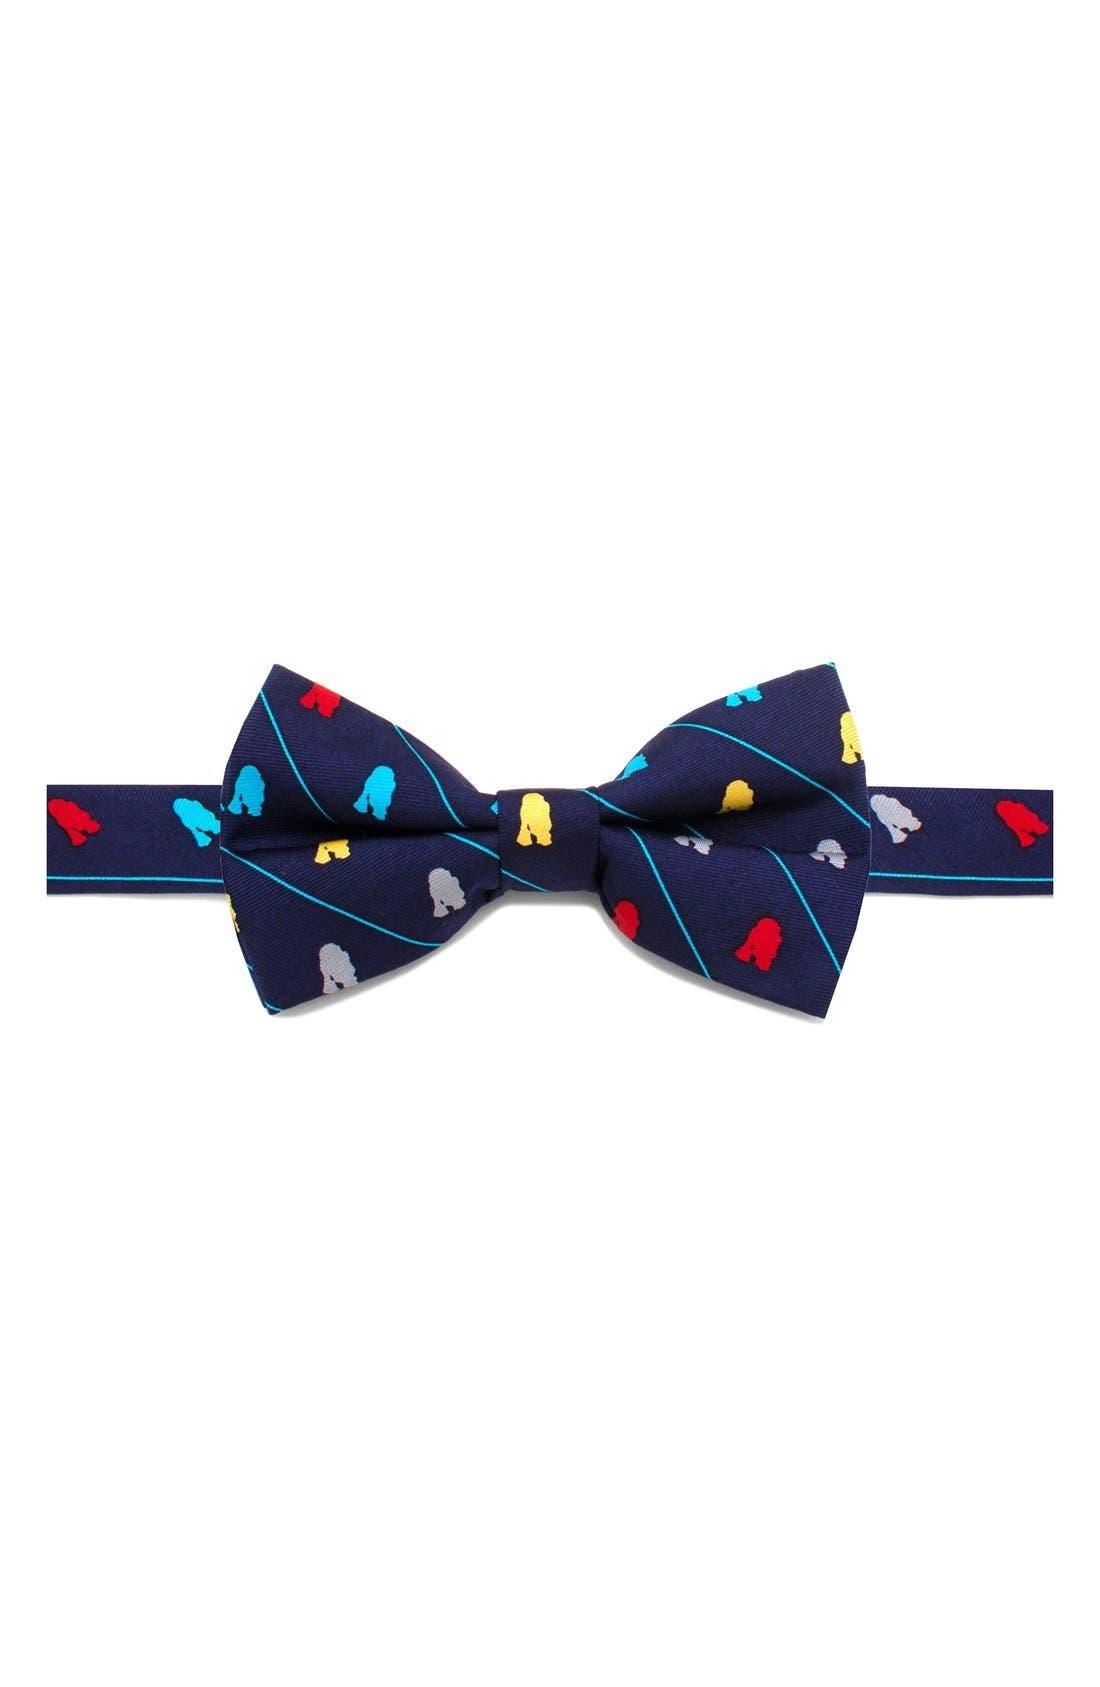 'Star Wars<sup>™</sup>- R2-D2 Stripe' Silk Bow Tie,                             Main thumbnail 1, color,                             460